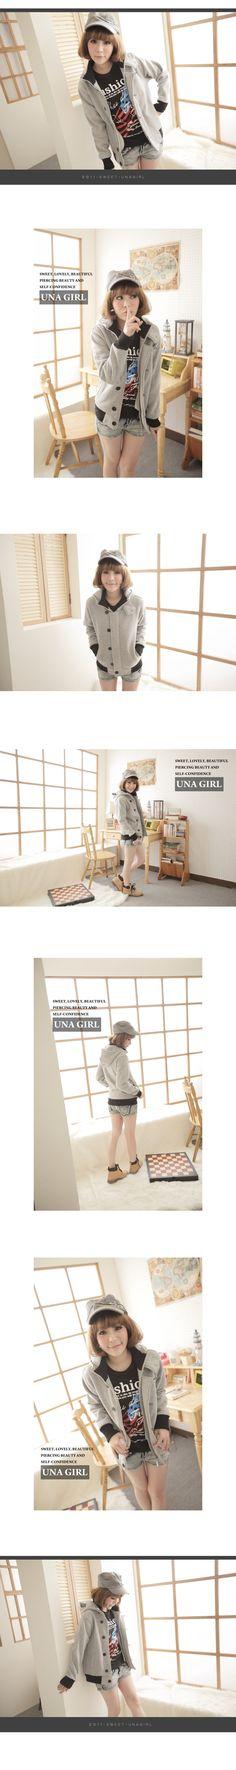 http://koreanstyle.com.tw/images/E0678/02.jpg